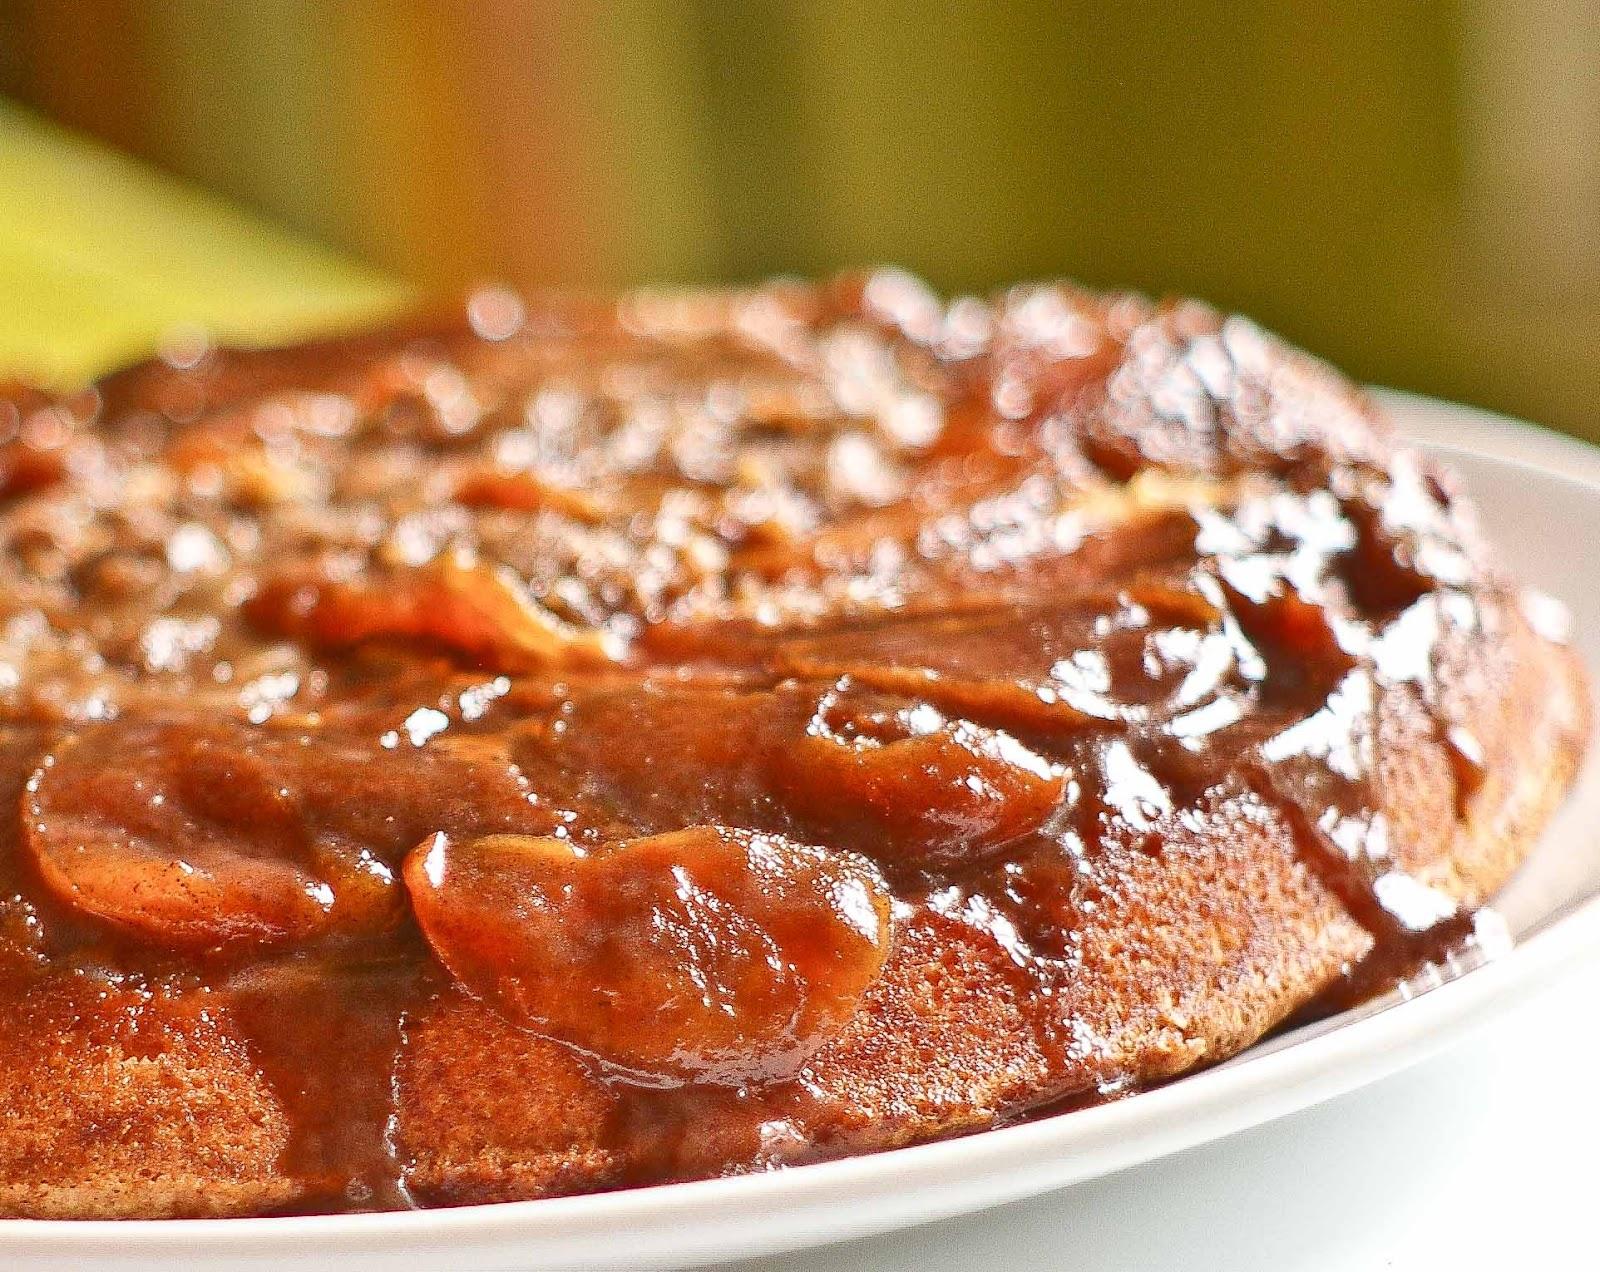 The Yum Yum Factor: Ooey Gooey Cinnamon Apple Upside Down Cake